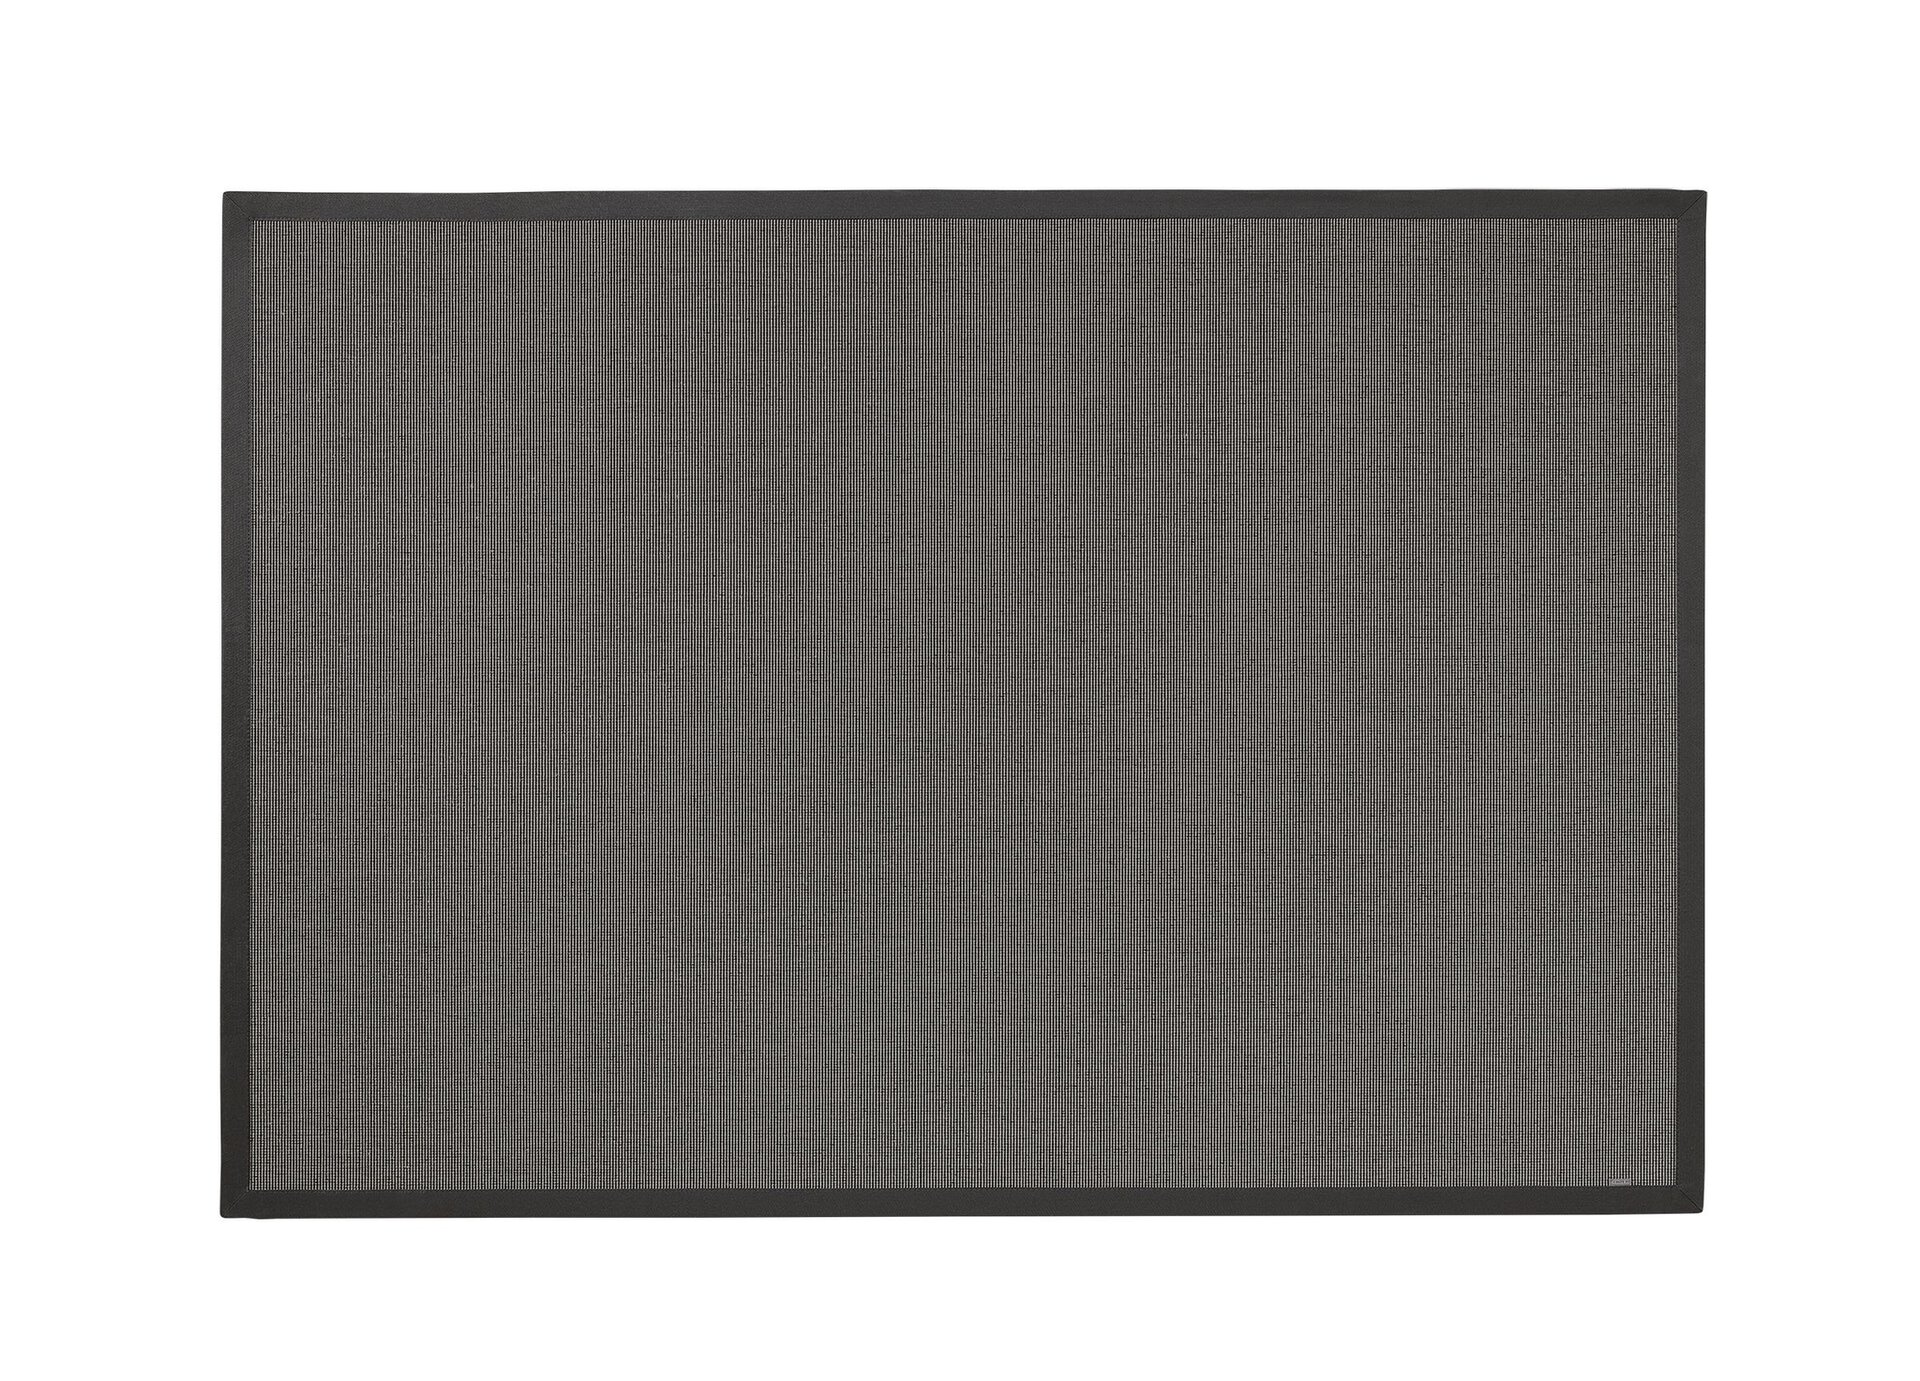 Outdoorteppich Naturino Rips DEKOWE Textil grau 67 x 150 cm